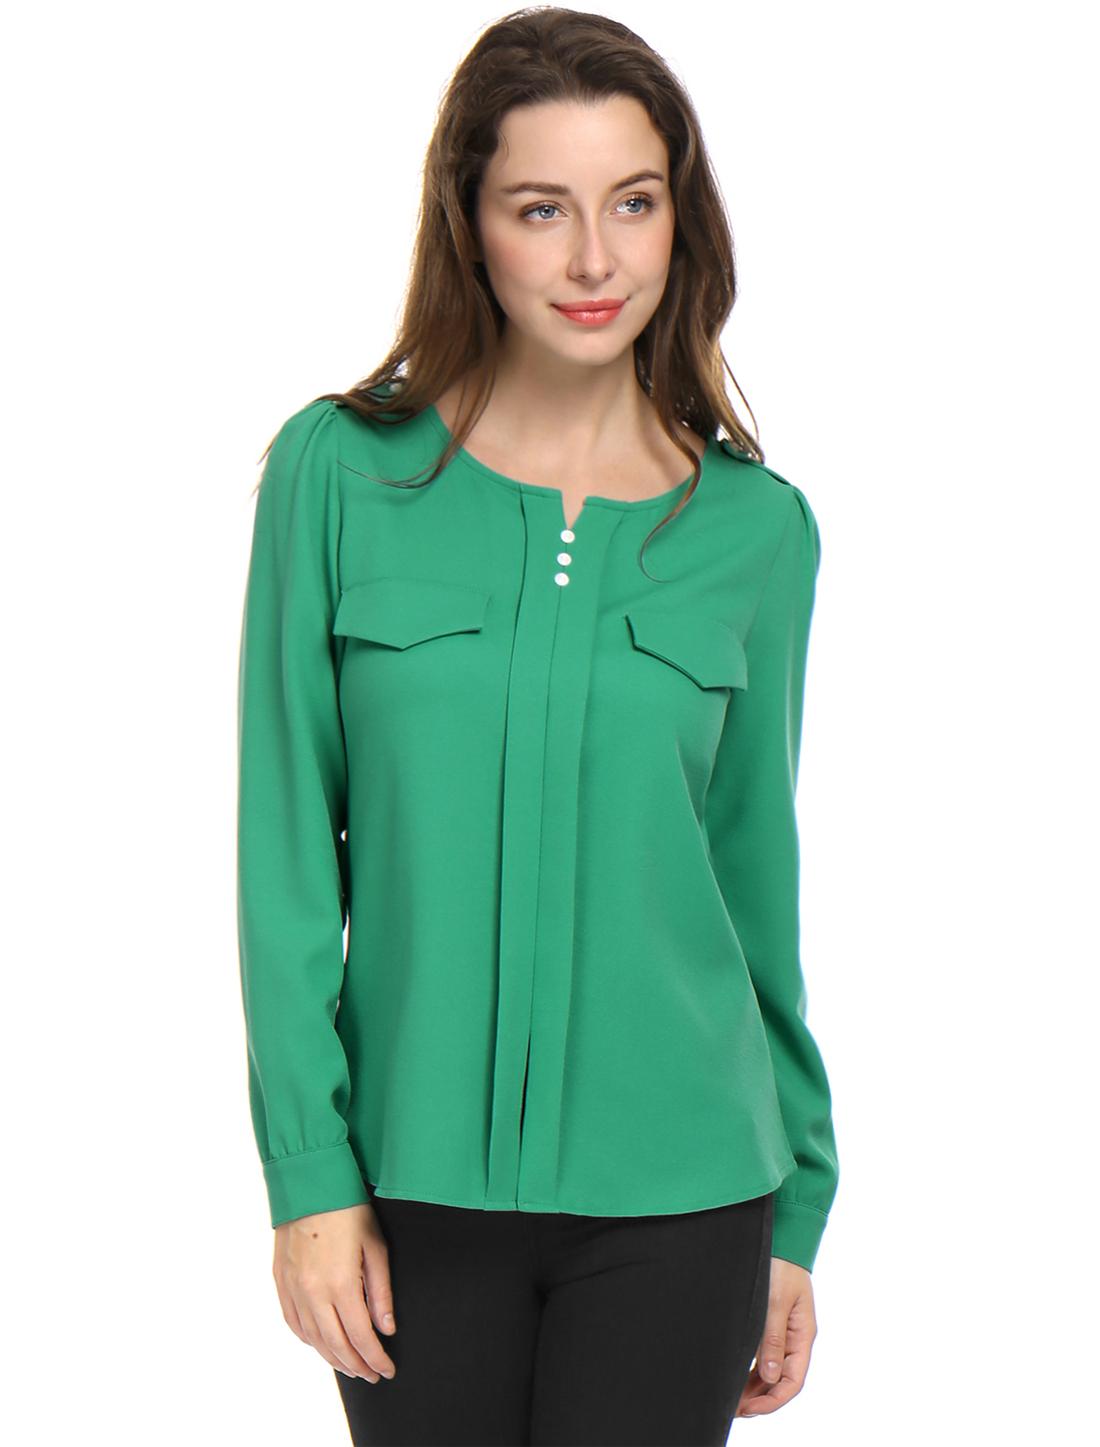 Women Long Sleeve Ruched Detail Fake Pockets Shirt Green S